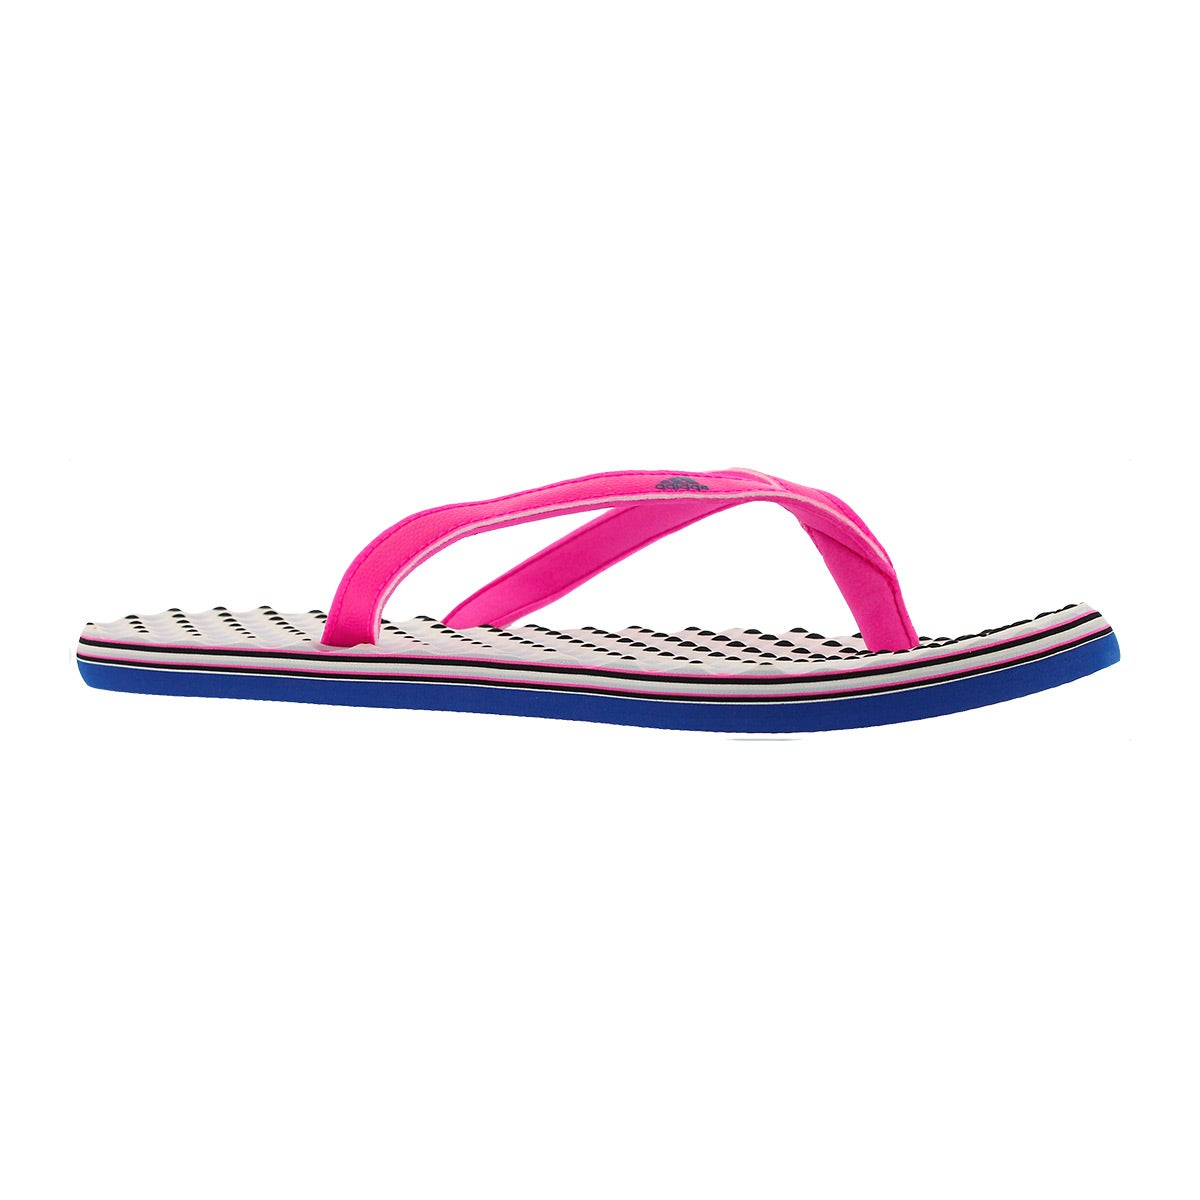 Lds Eezay Dots pink/navy thong sandal